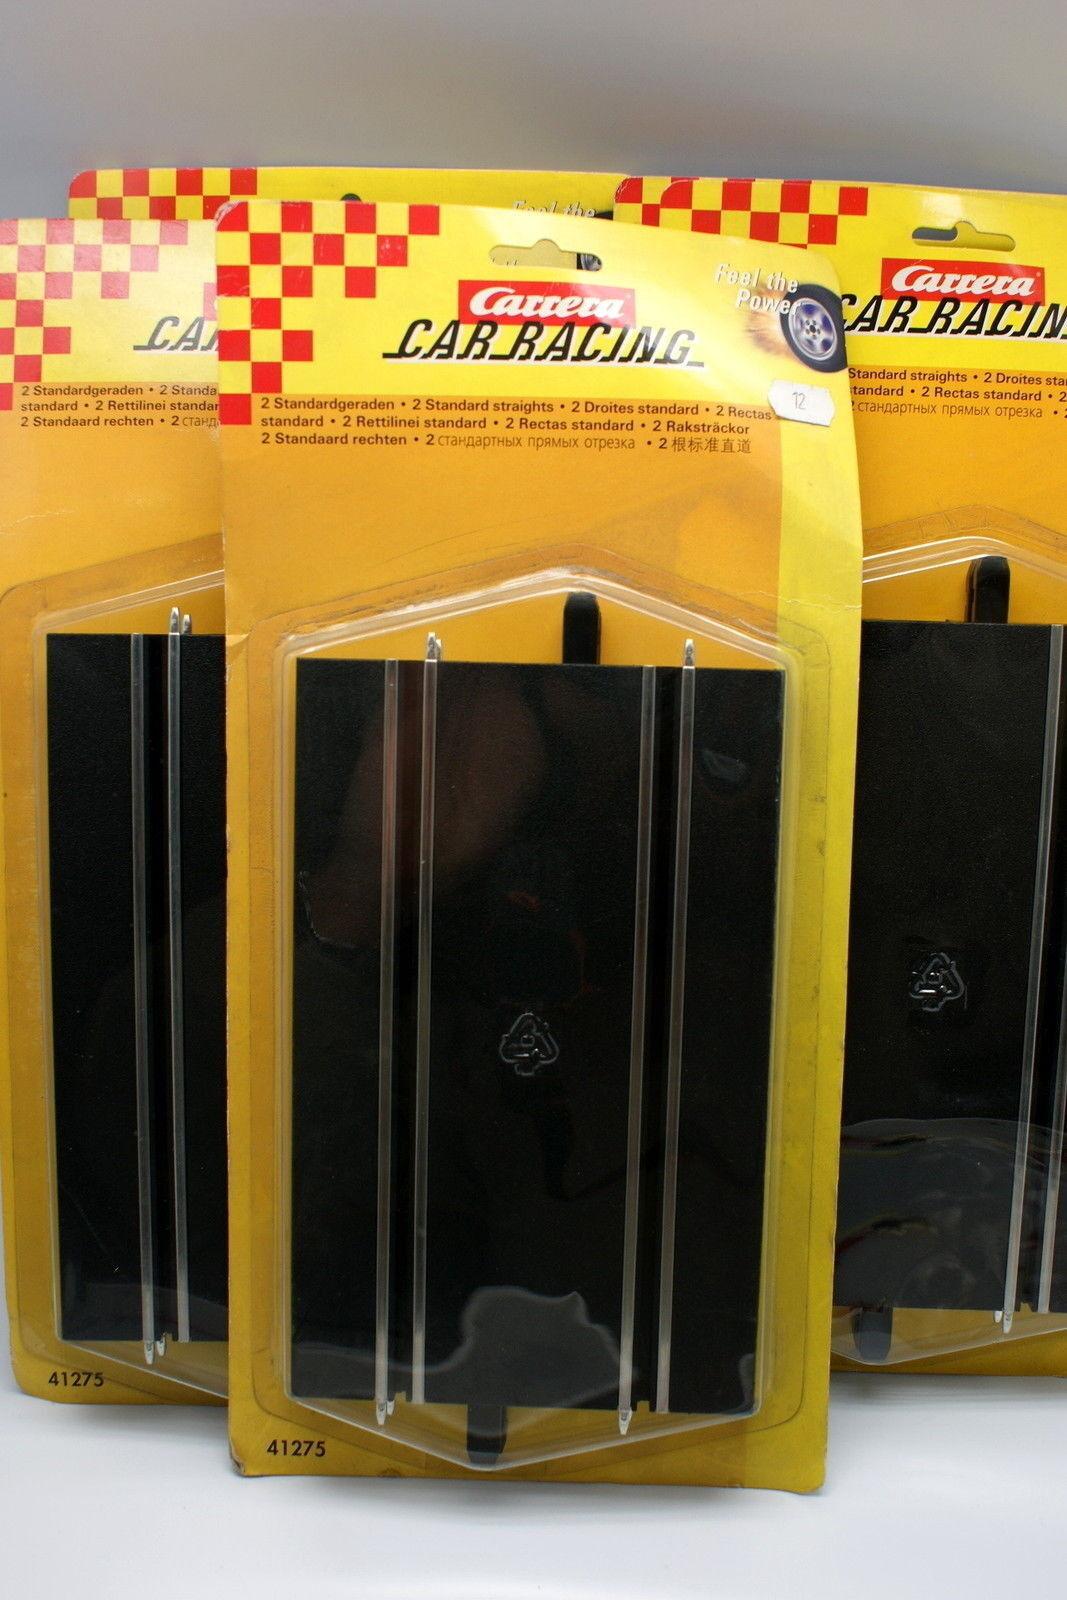 Carrera 1 32 - Lot de 5 Rails droit sous Blister Car Racing